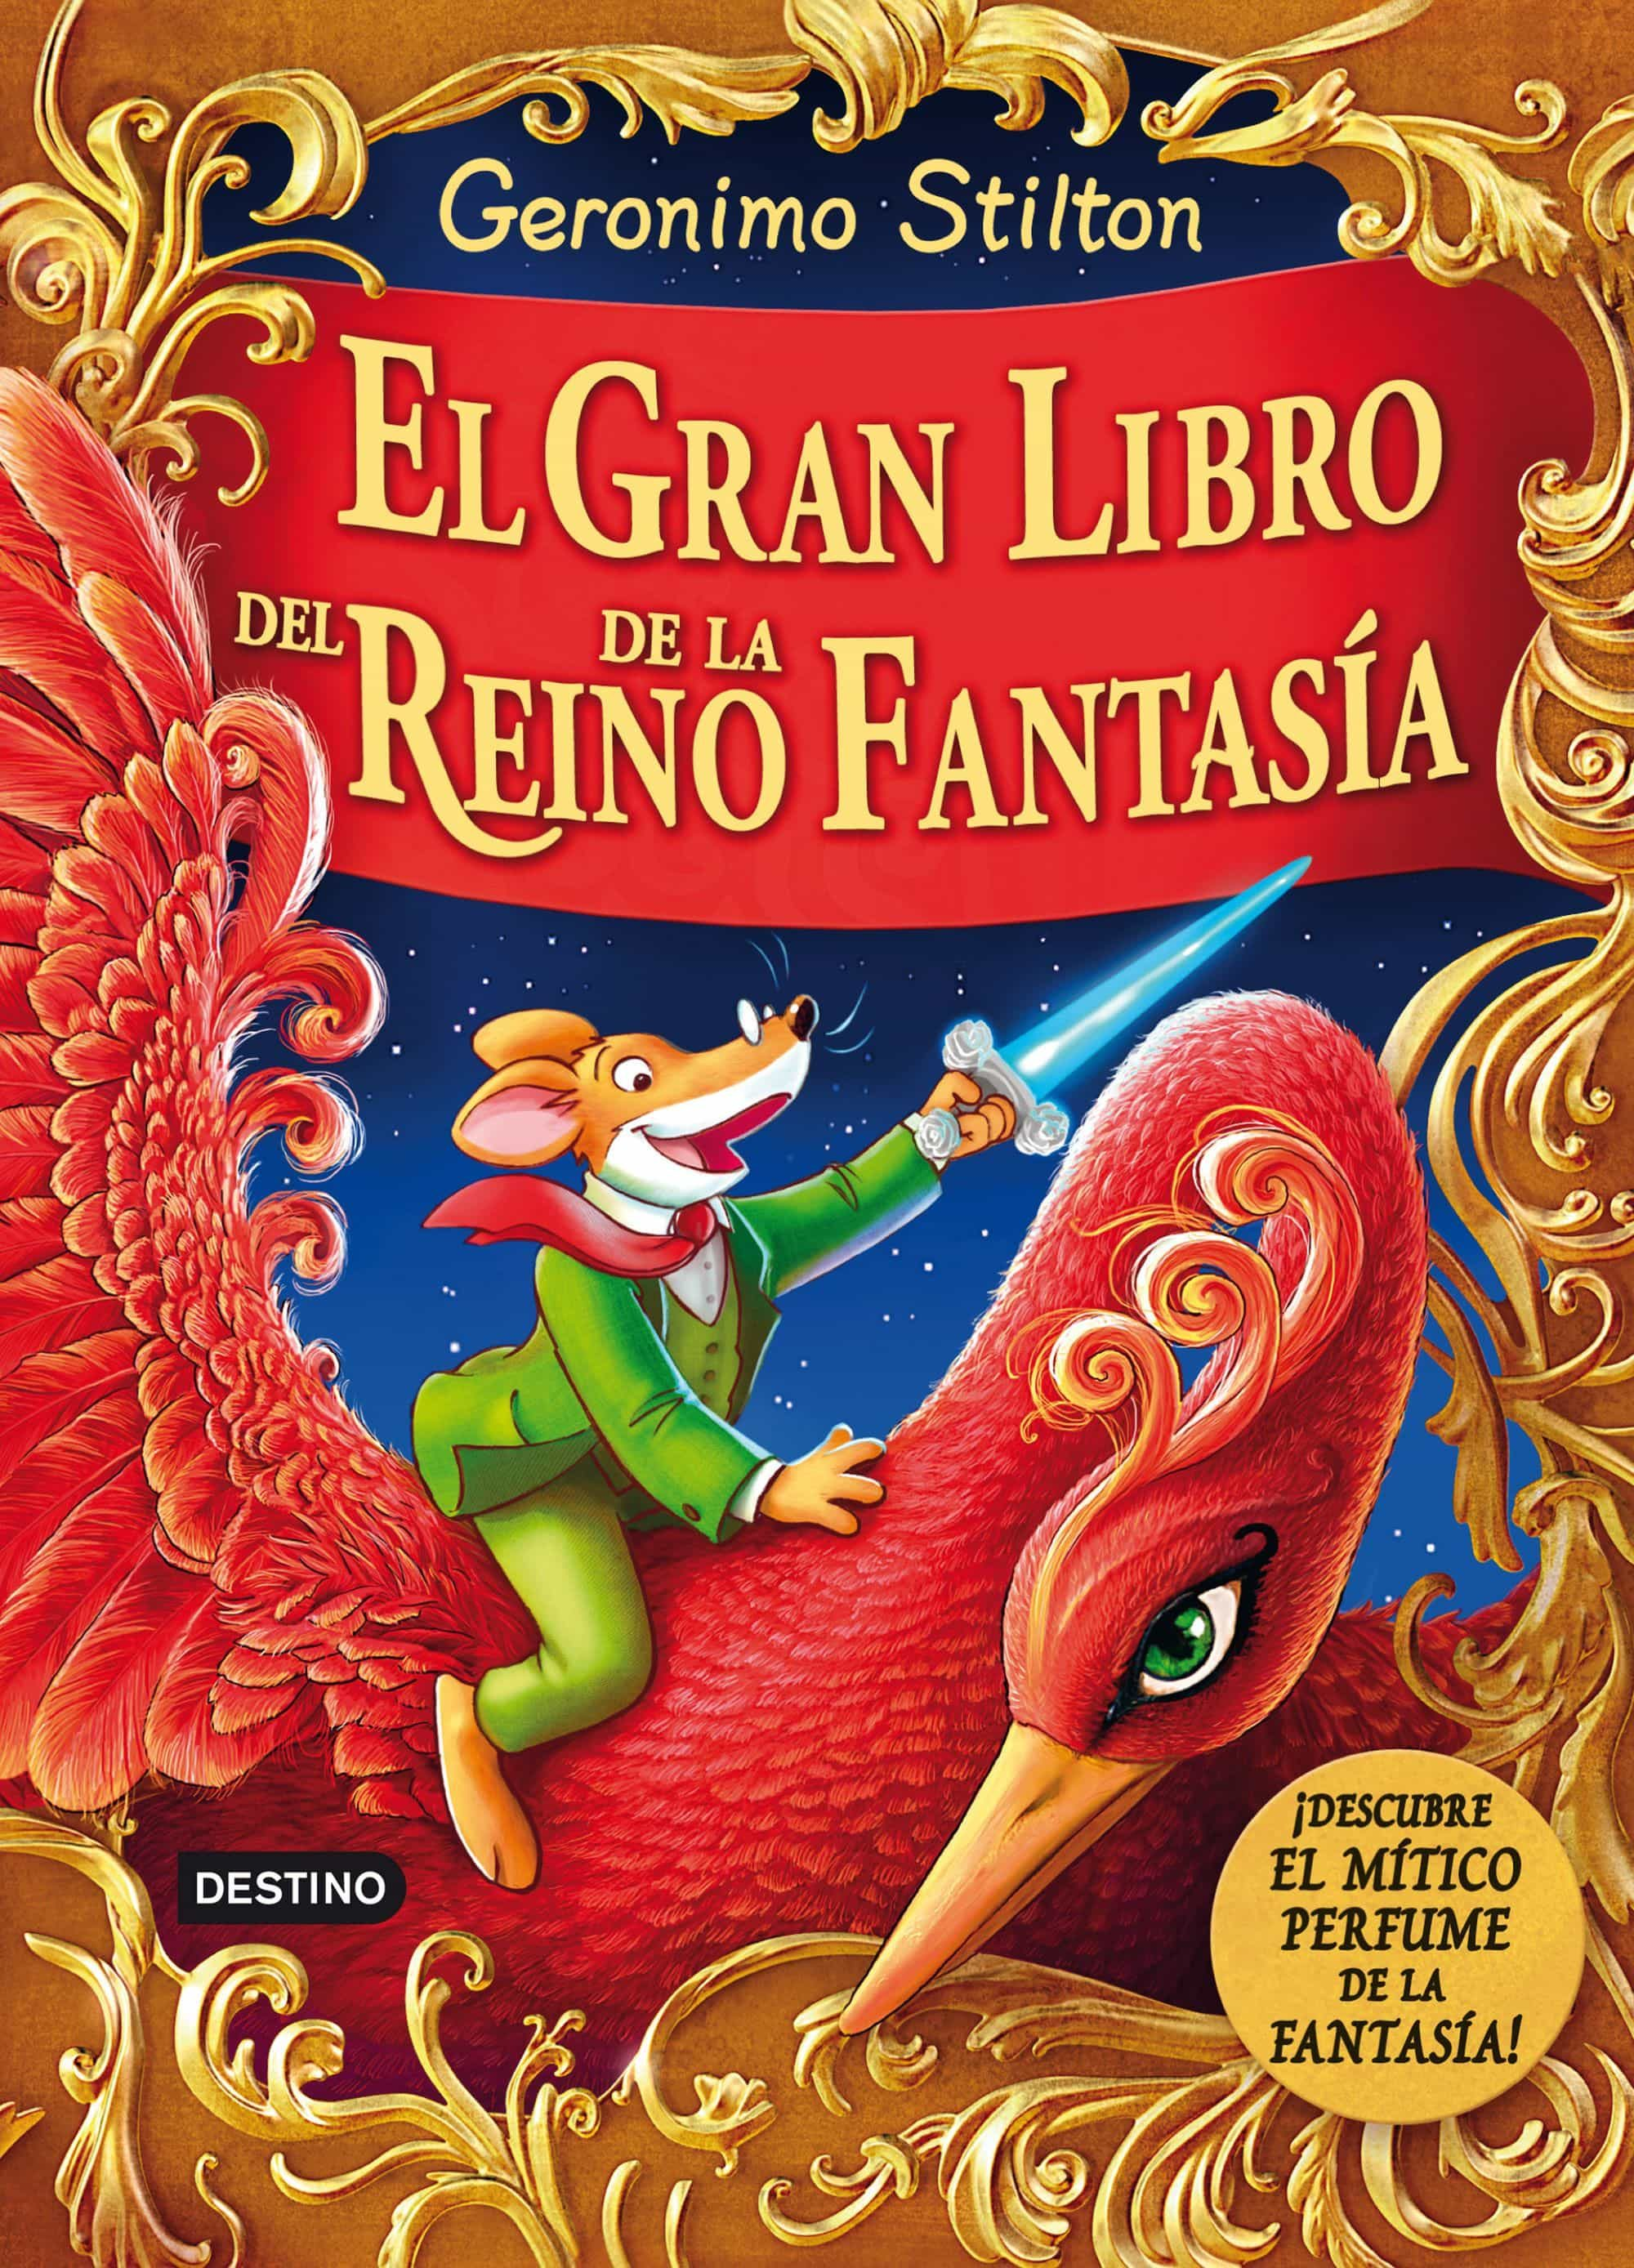 el gran libro del reino de la fantasia-geronimo stilton-9788408132004